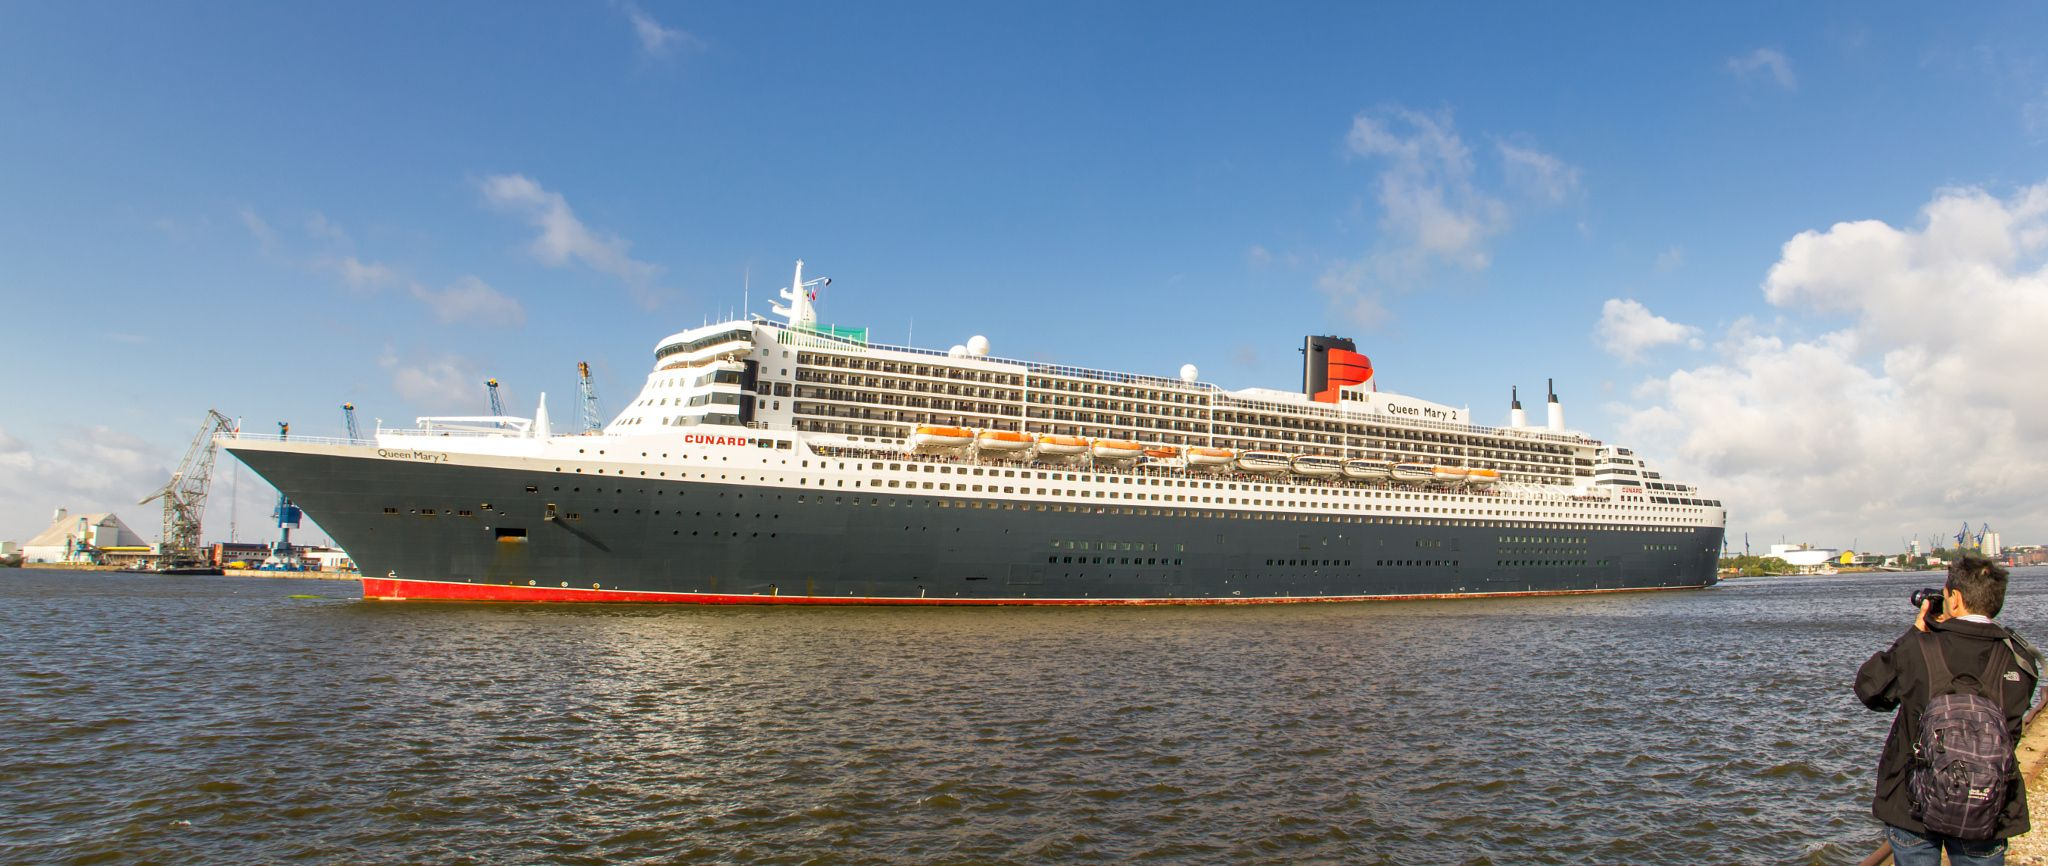 Queen Mary 2 and Tourist by Michael Schloz on 500px. #QueenMary2 #QueenMary #Hamburg #Hamburgbyday #HafenCity #portofhamburg #ship #cruiser #cruiseliner #Strandkai #tourist #transport